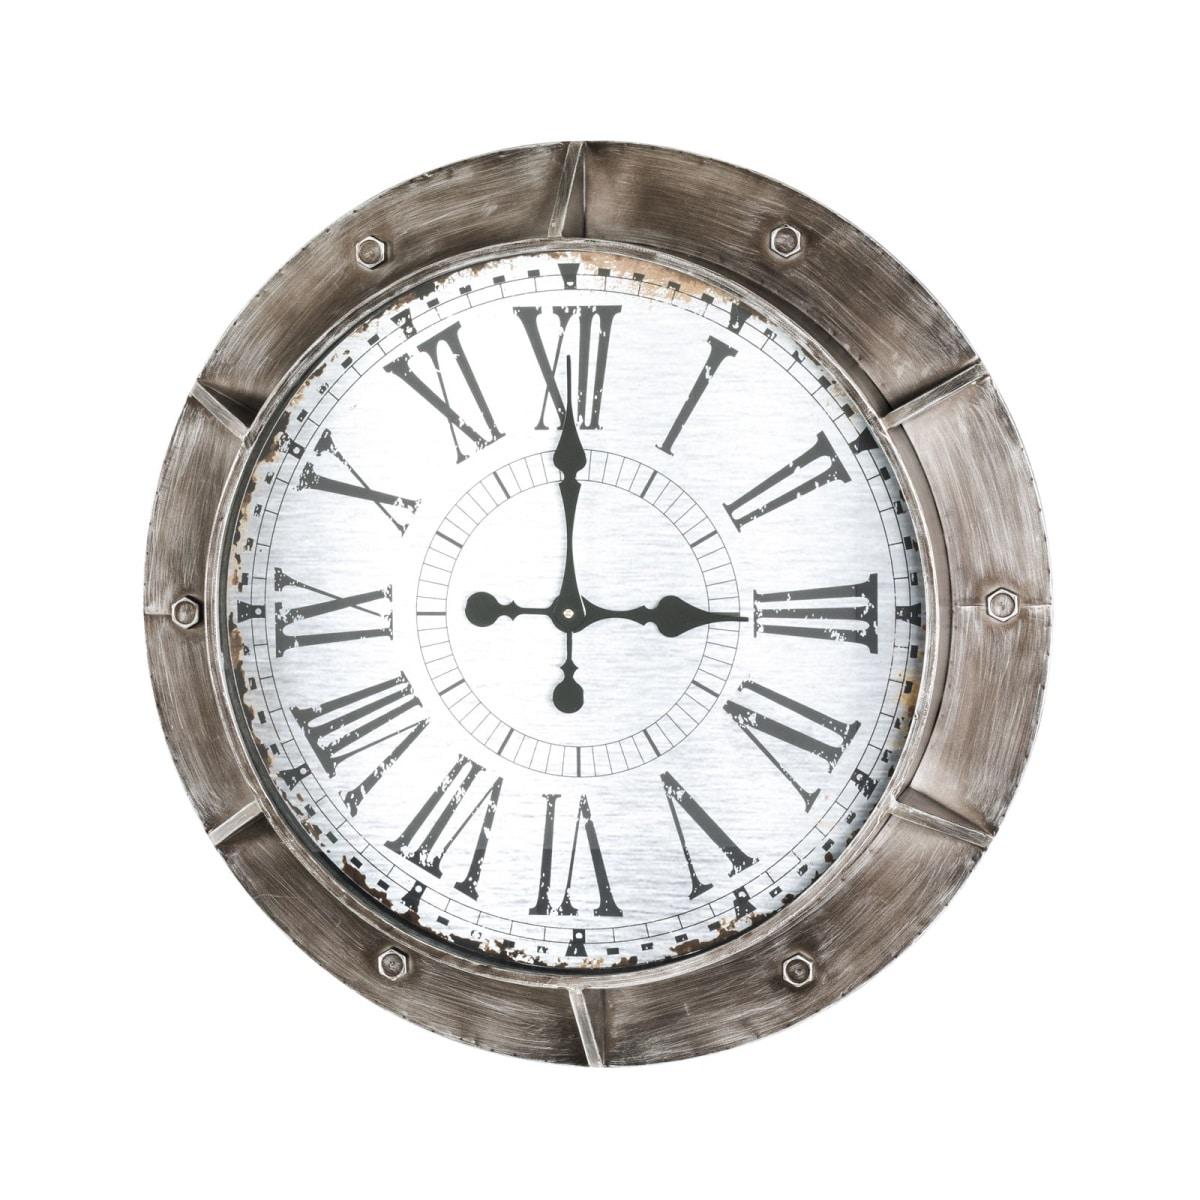 Wanduhr 76 x 9 cm Metall braun weiß